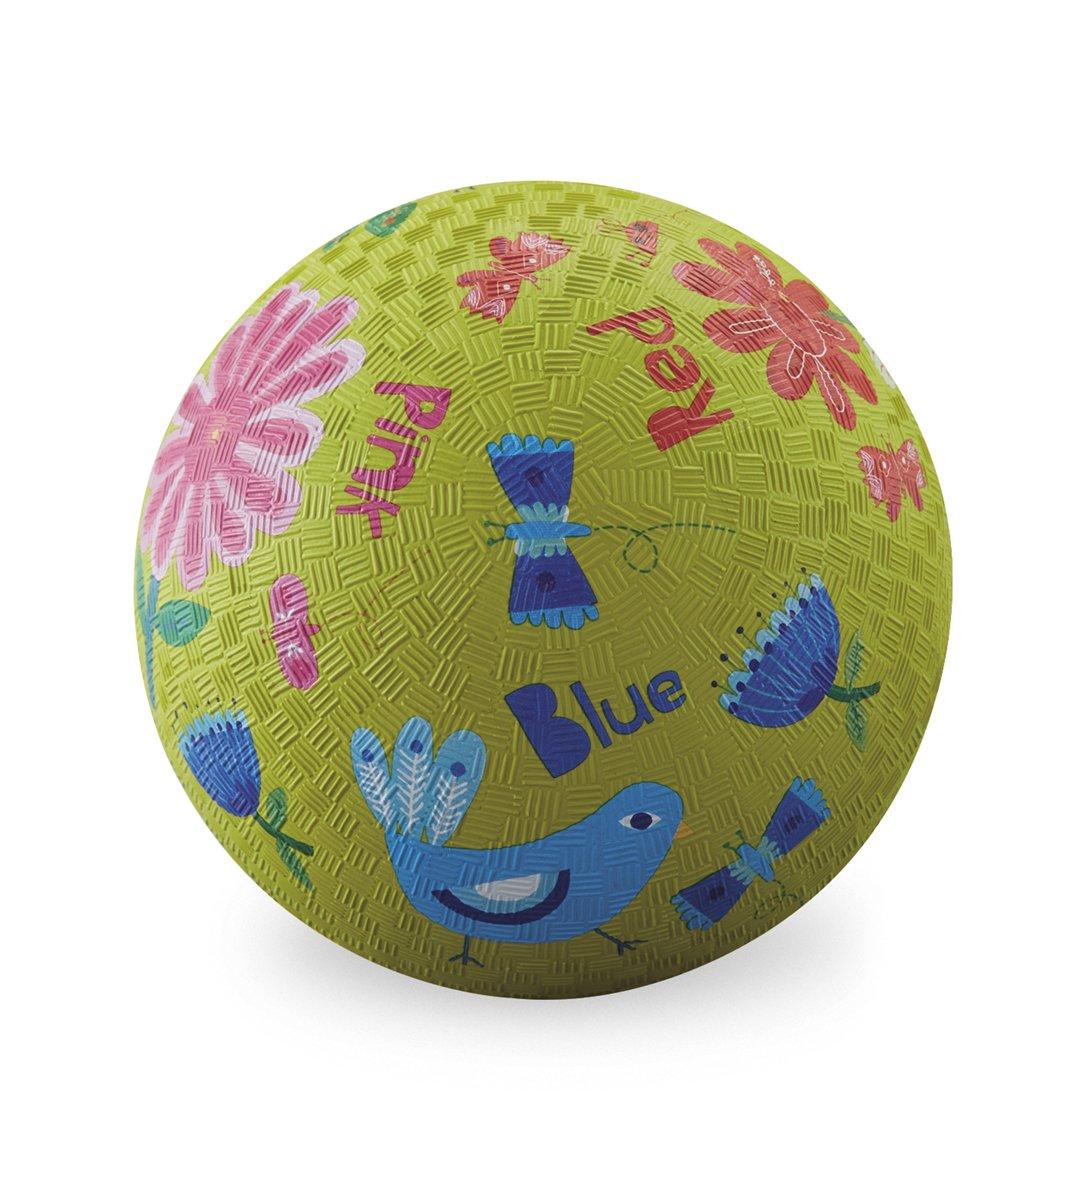 Crocodile Creek Jardin Couleurs Playground Ball, Citron Vert, 17,8cm 8cm 2157-4